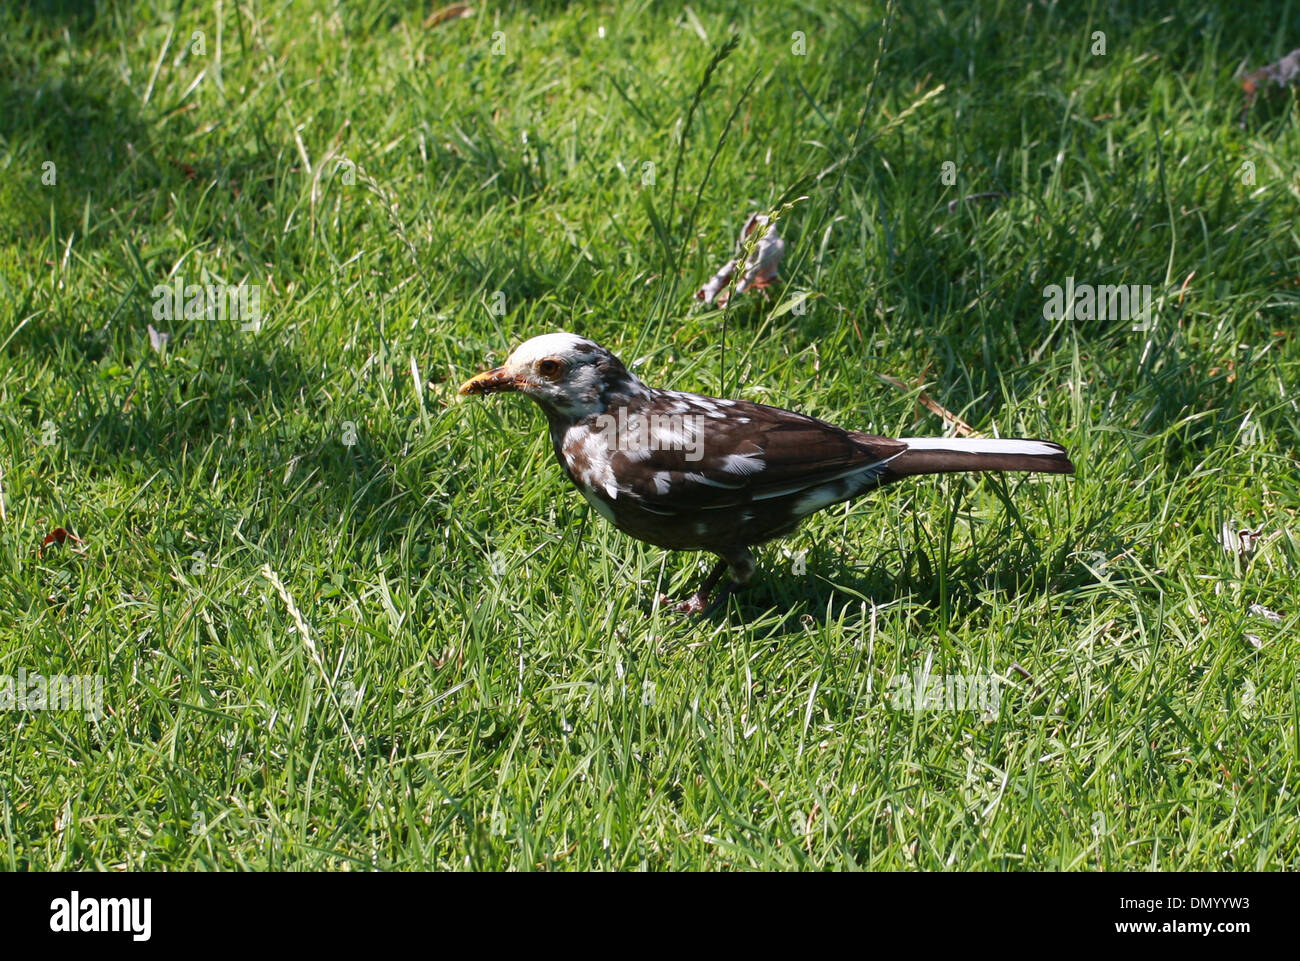 Male Blackbird Displaying Leucism and Browning, Turdus merula merula, Turdidae. - Stock Image